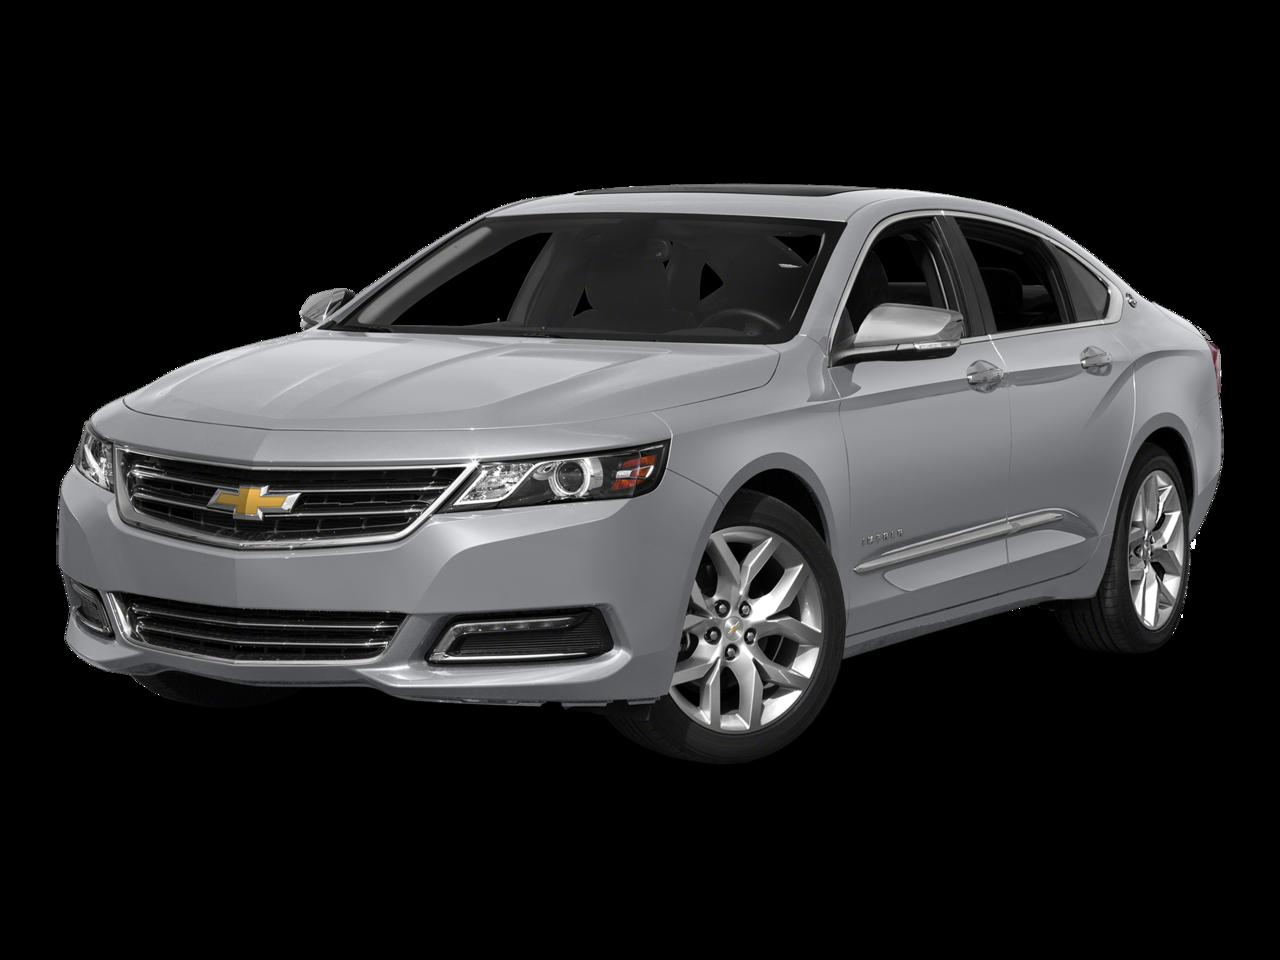 Clipart car impala. Chevrolet png image purepng